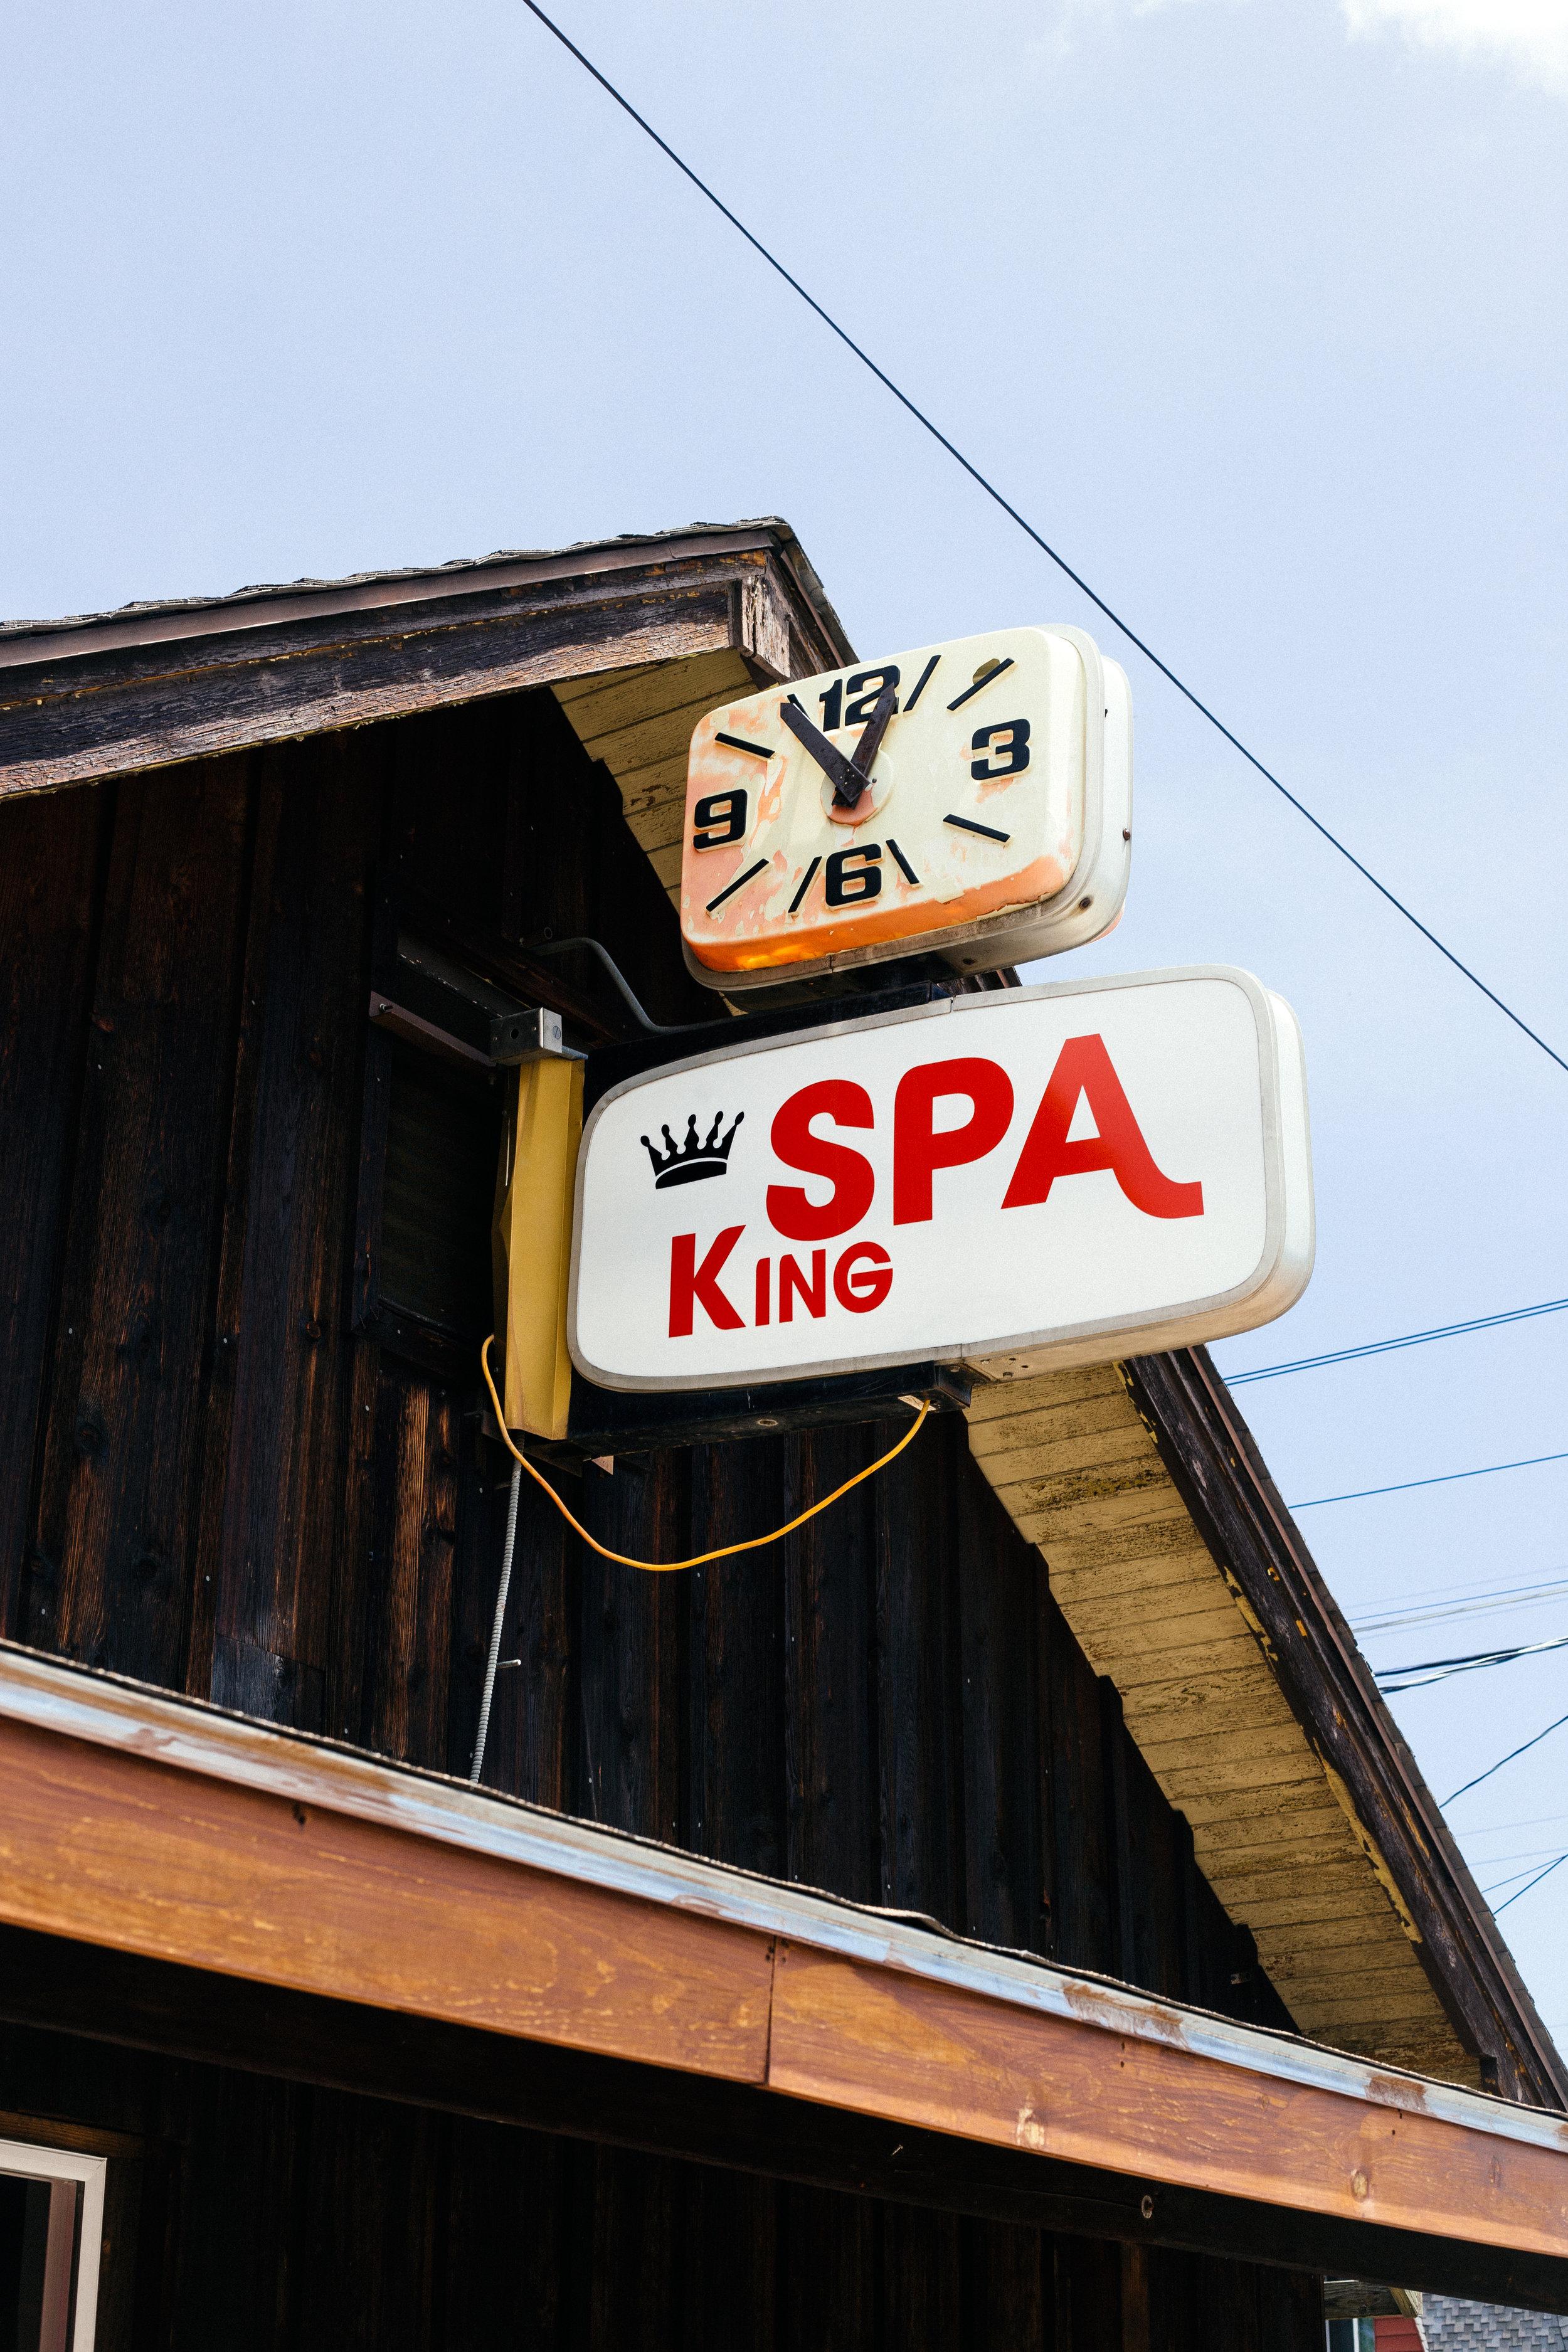 Spa King.jpg